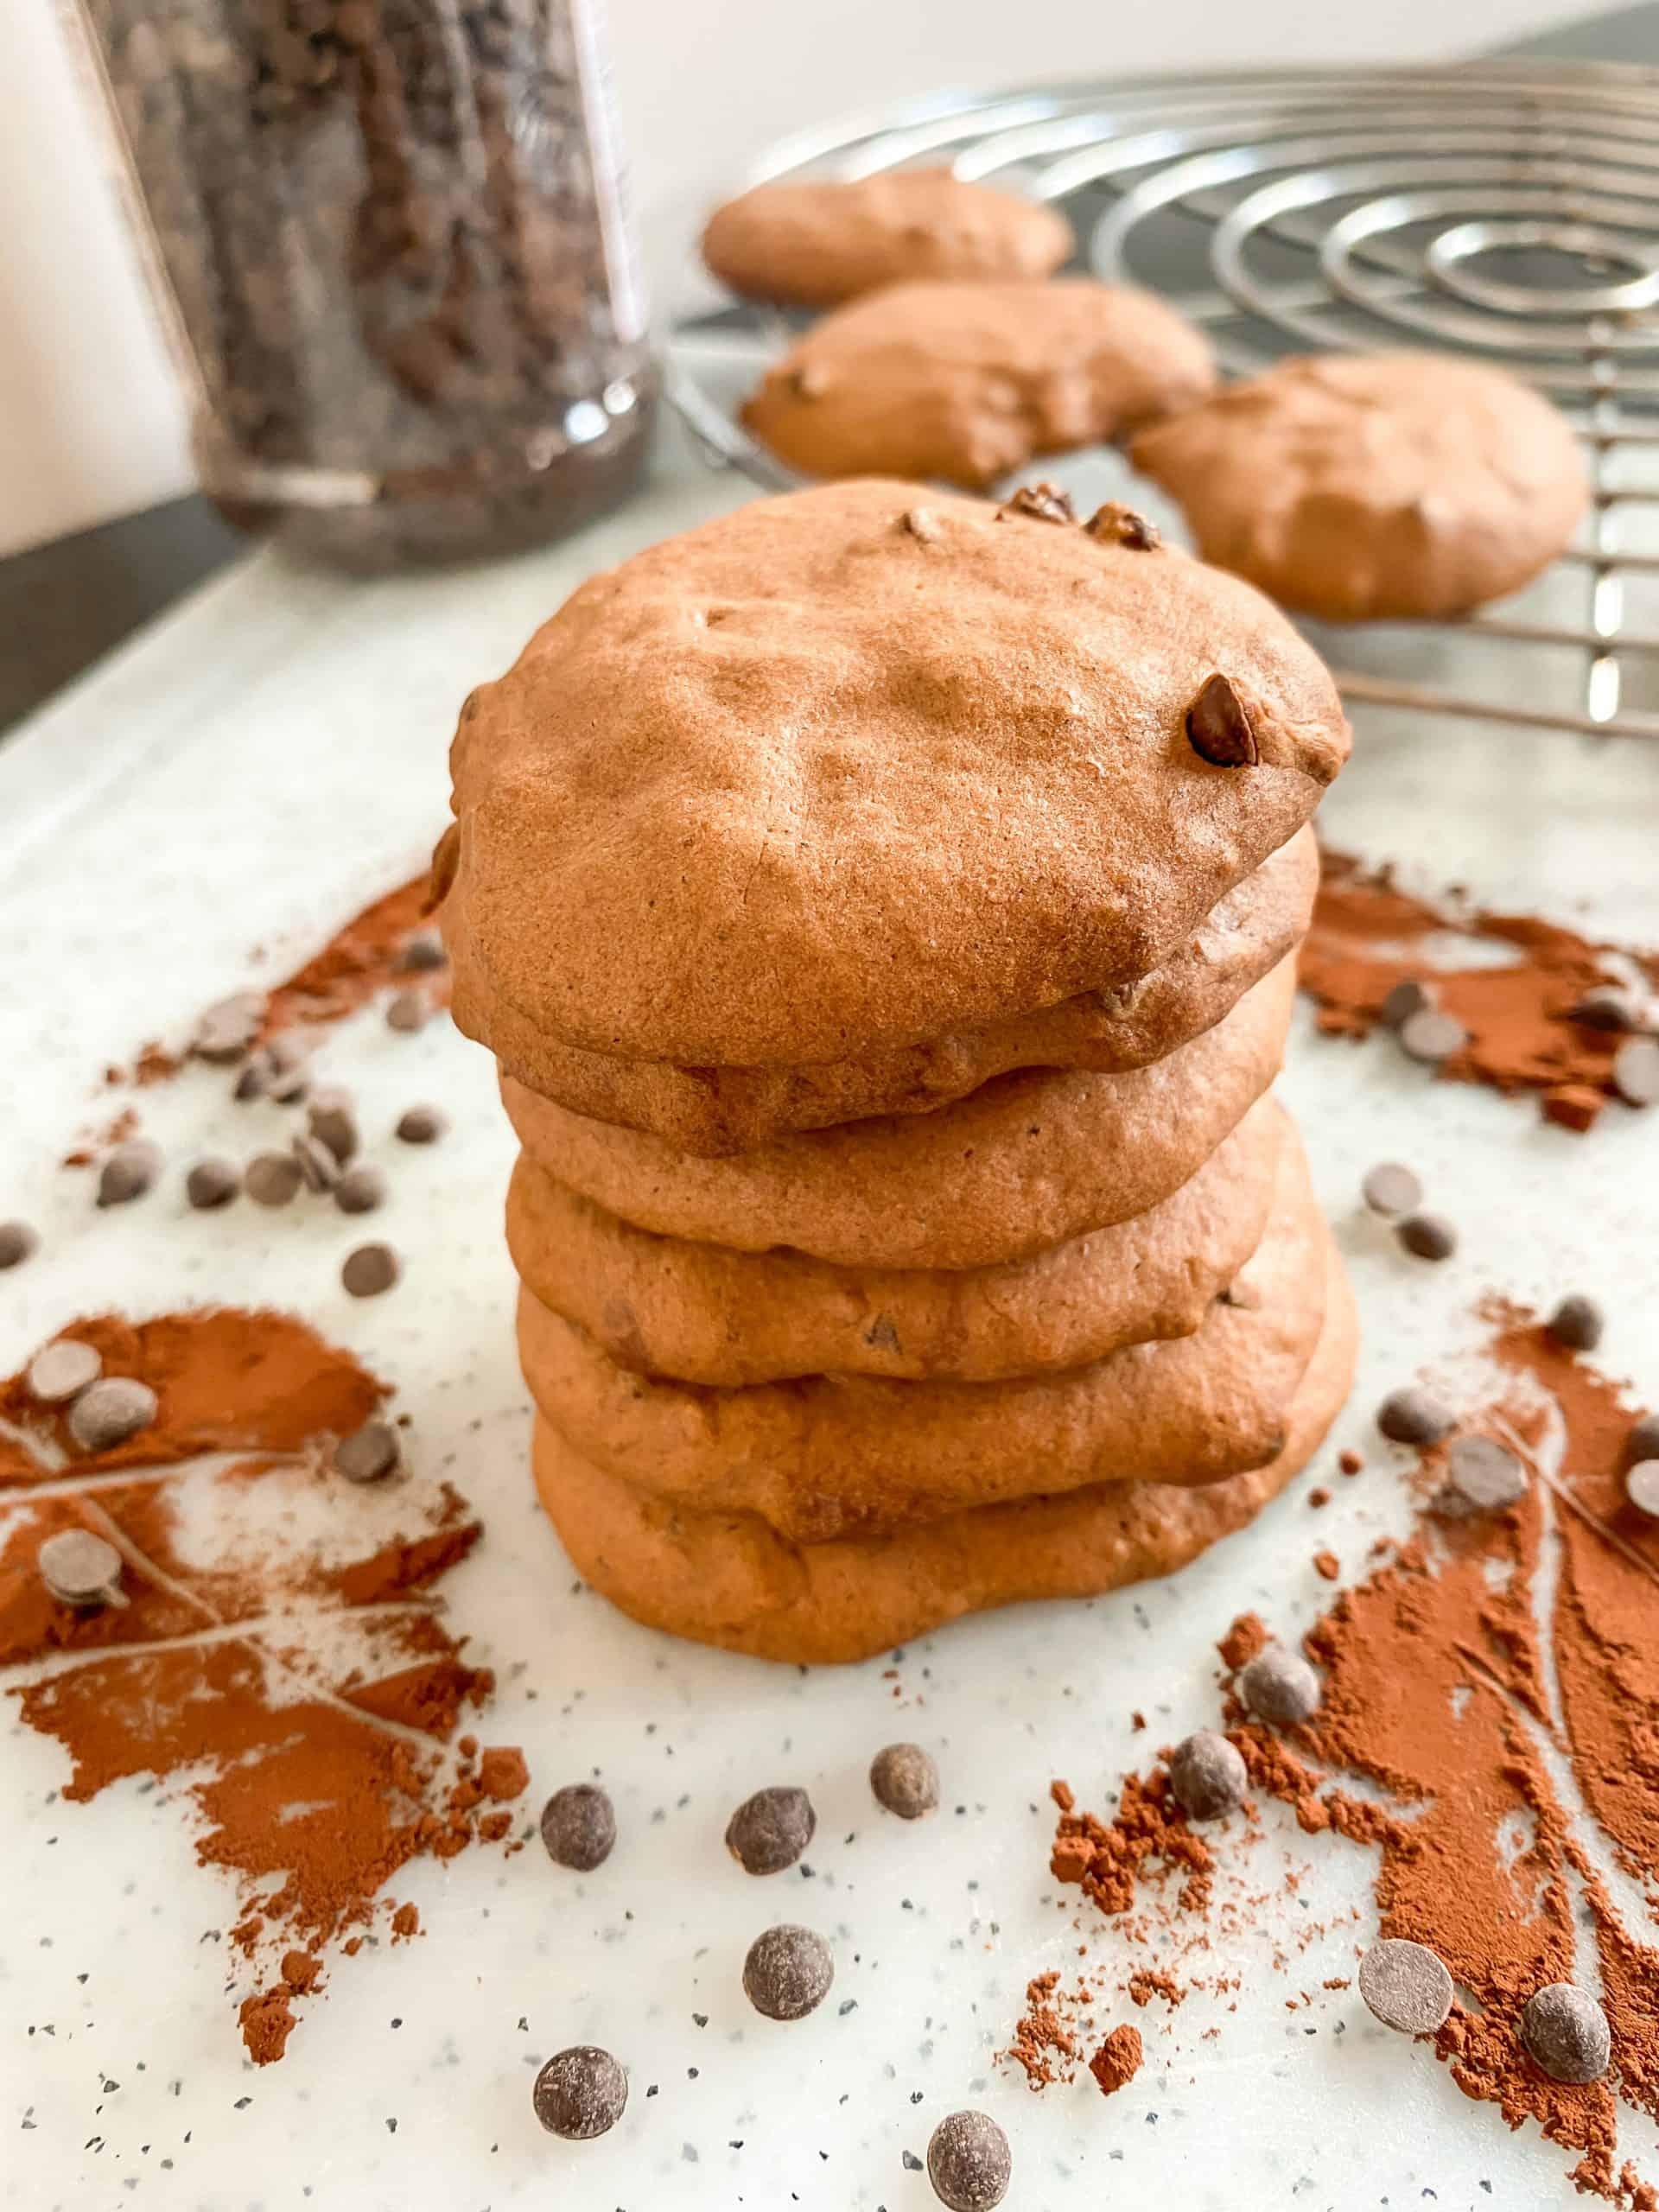 Chocolate-banana cookies